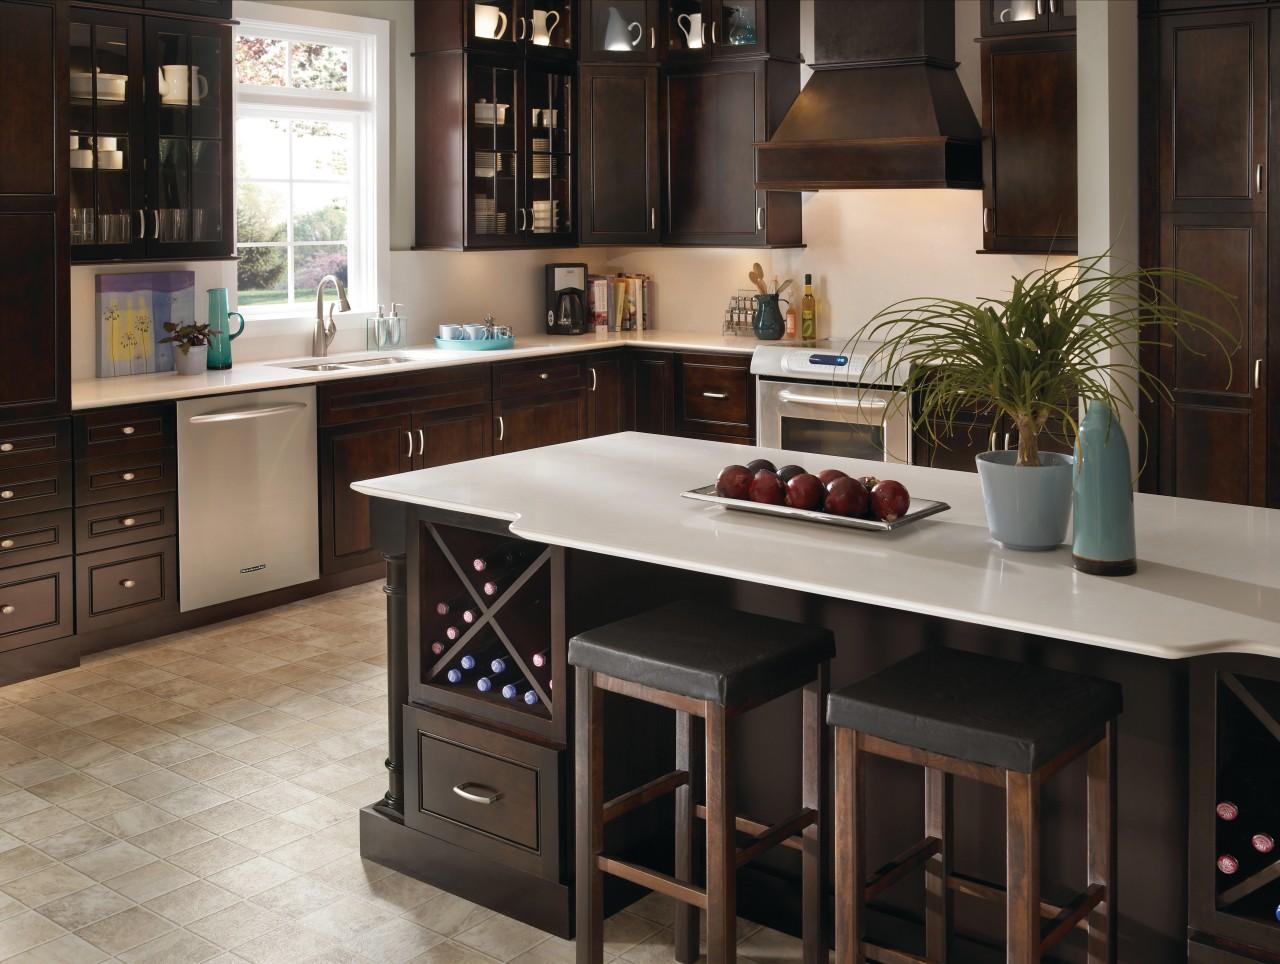 Crisp white Silestone Quartz Yukon Blanco countertops feature cabinetry, countertop, cuisine classique, flooring, furniture, interior design, kitchen, black, gray